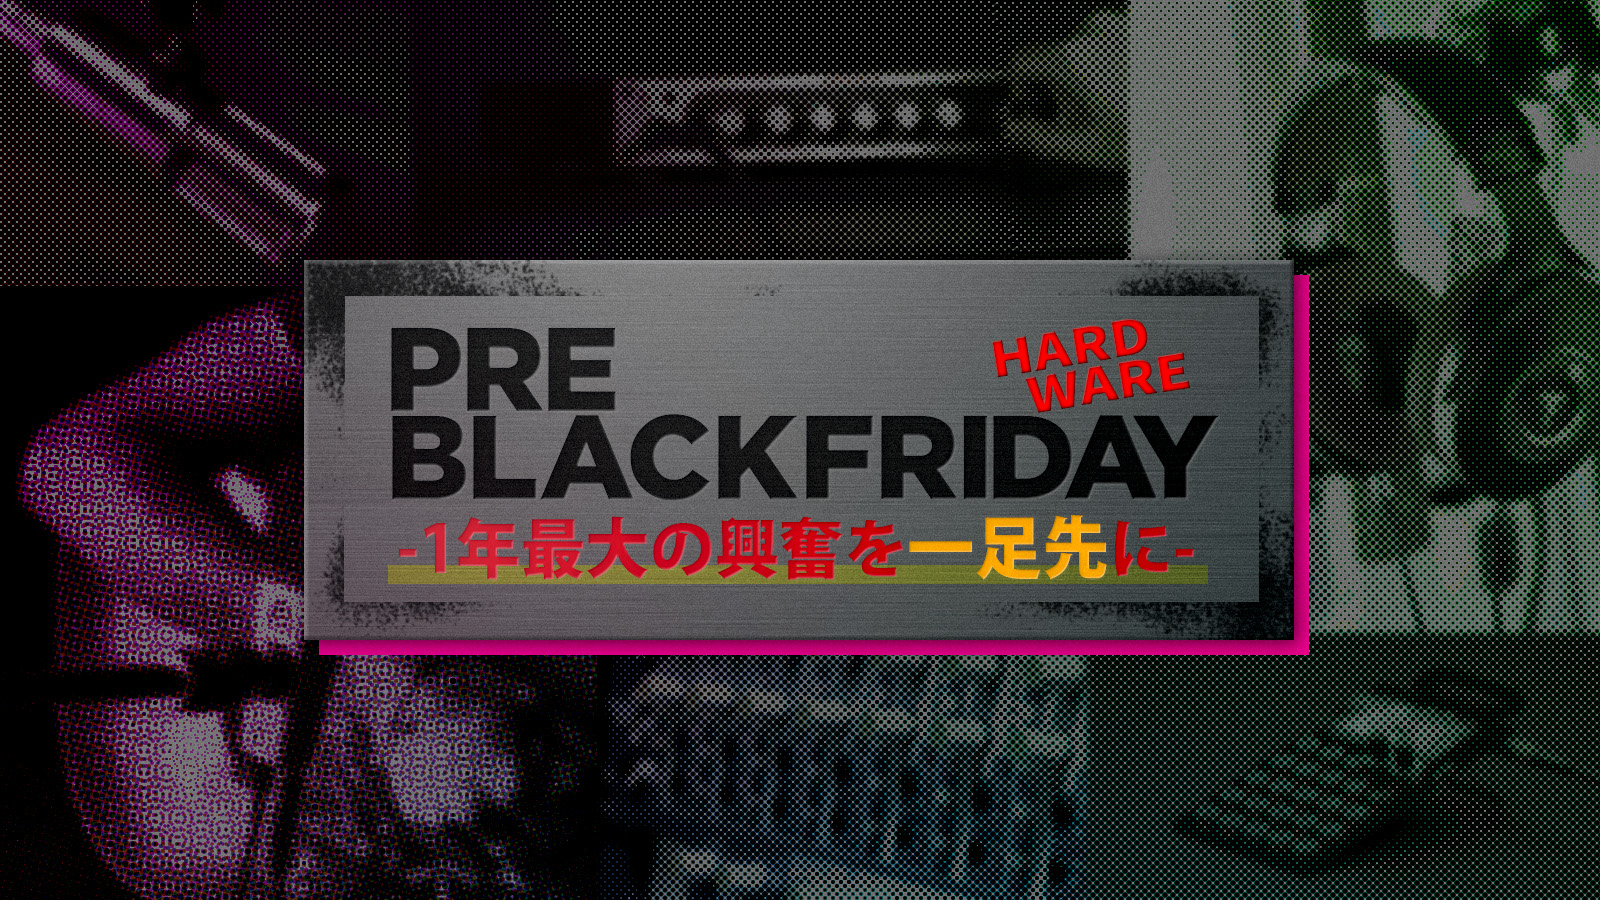 PRE BLACK FRIDAY 2021 ハードウェアプロモーション